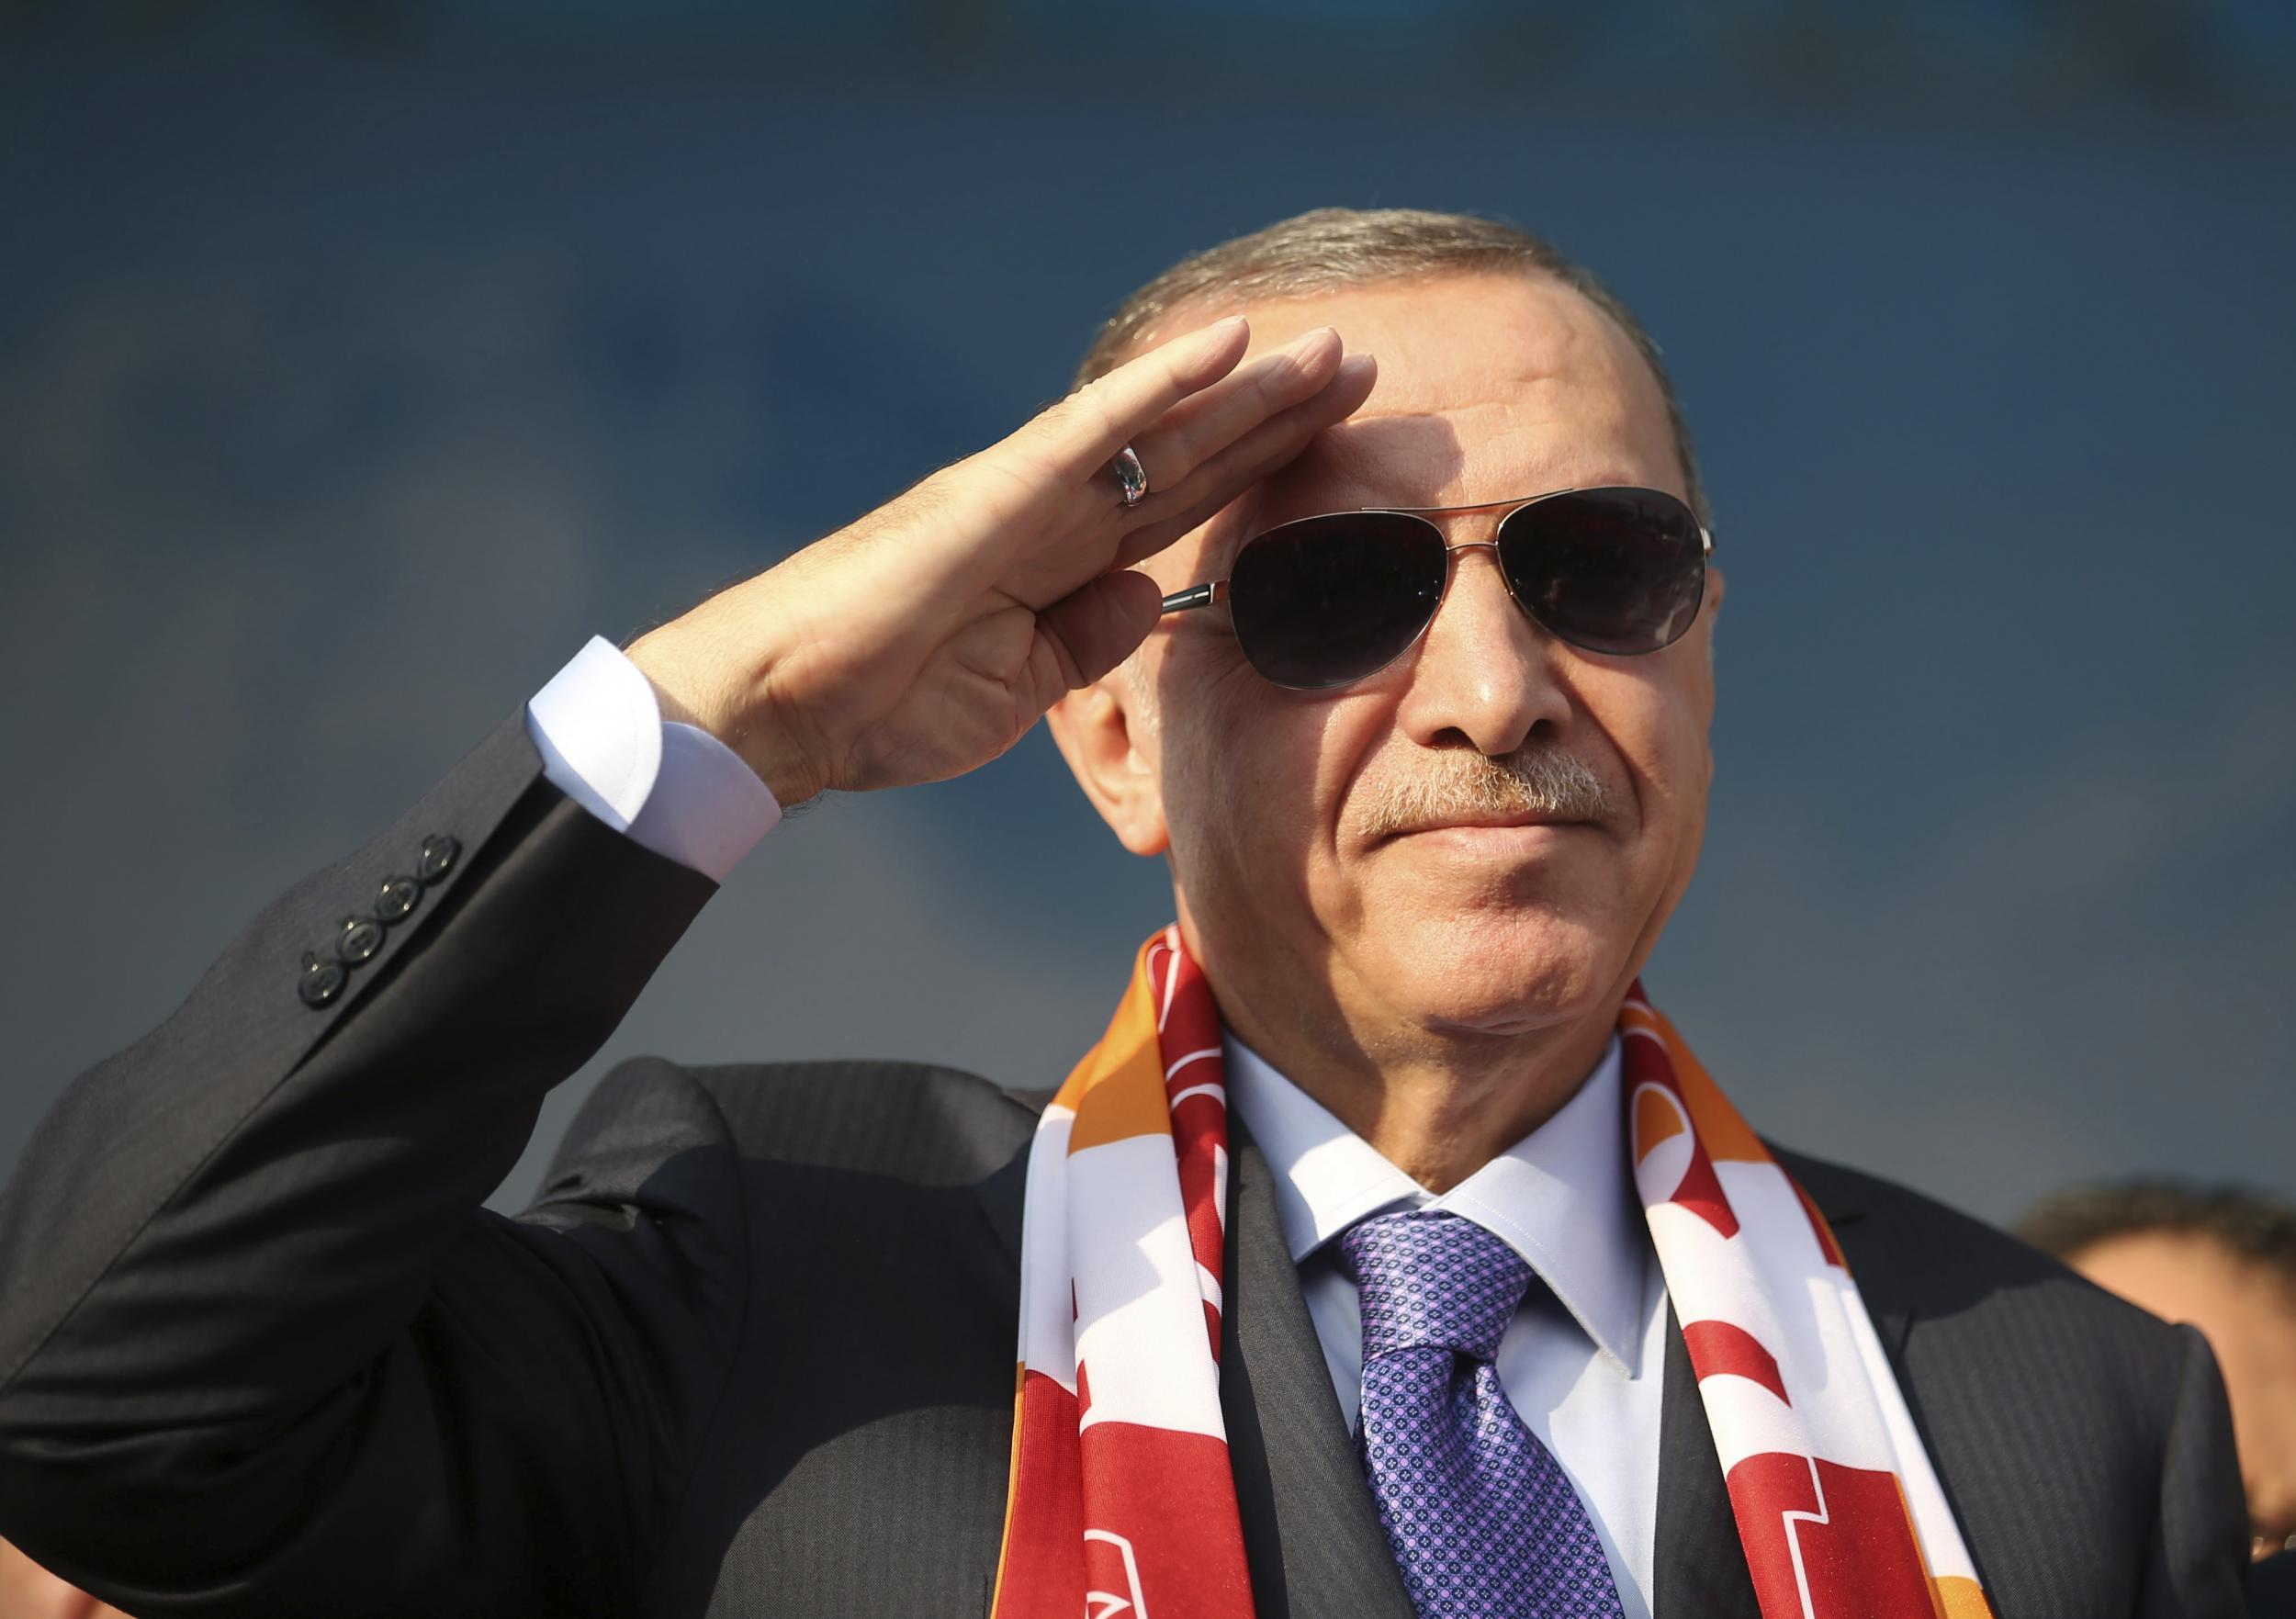 Turkey president Erdogan vows to 'crush the heads' of Kurdish fighters in Syria